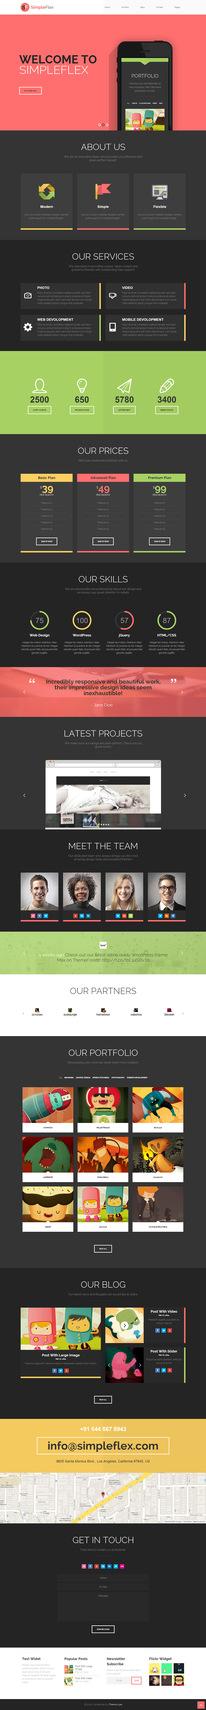 Web Design / #webdesign — Designspiration